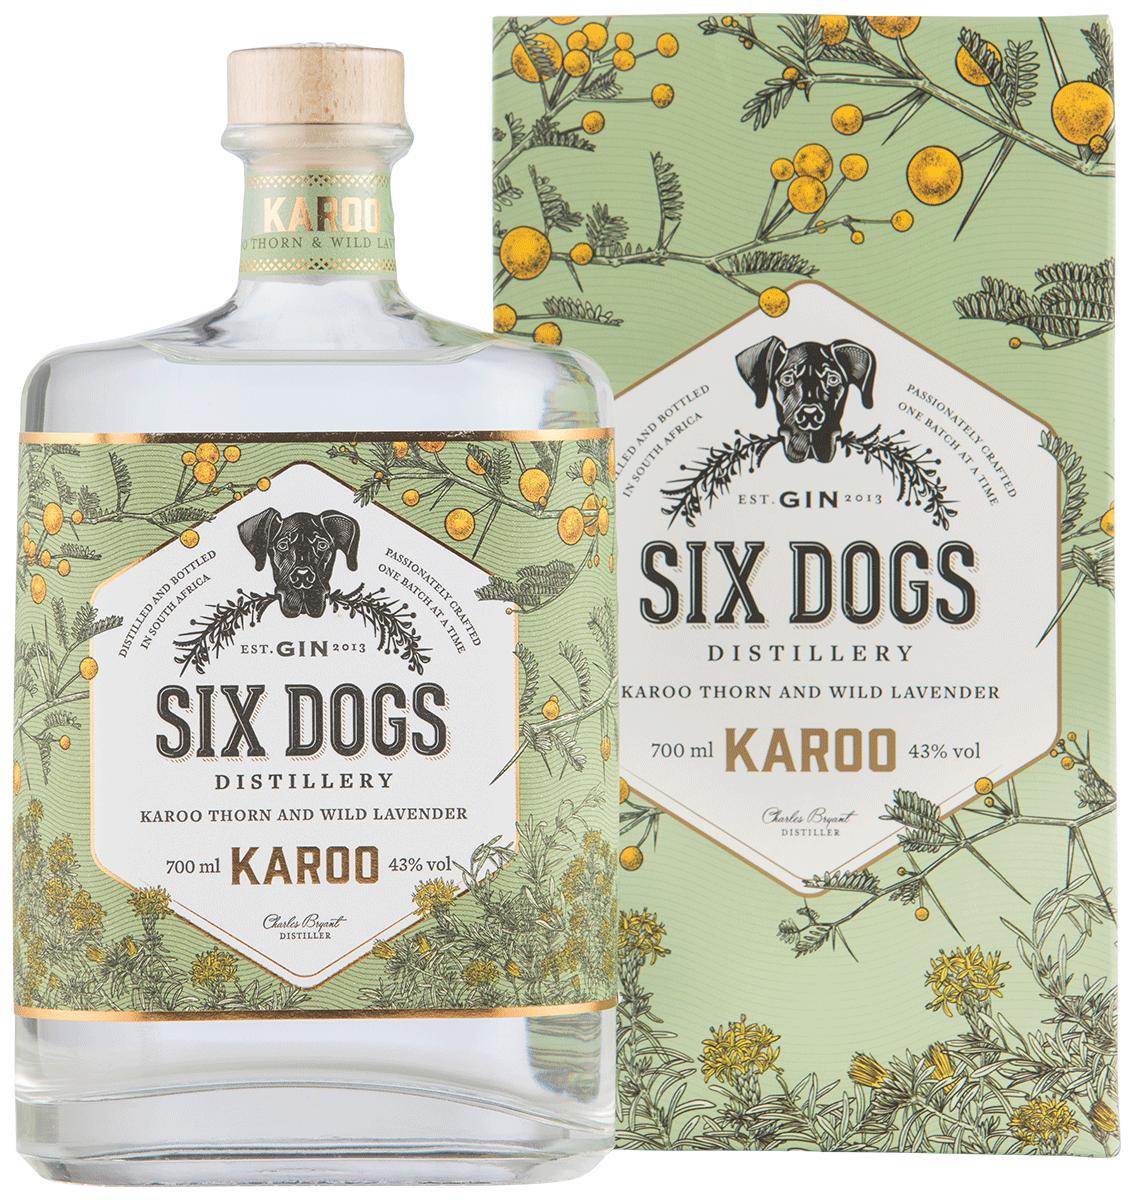 Six Dogs Distillery Karoo Gin